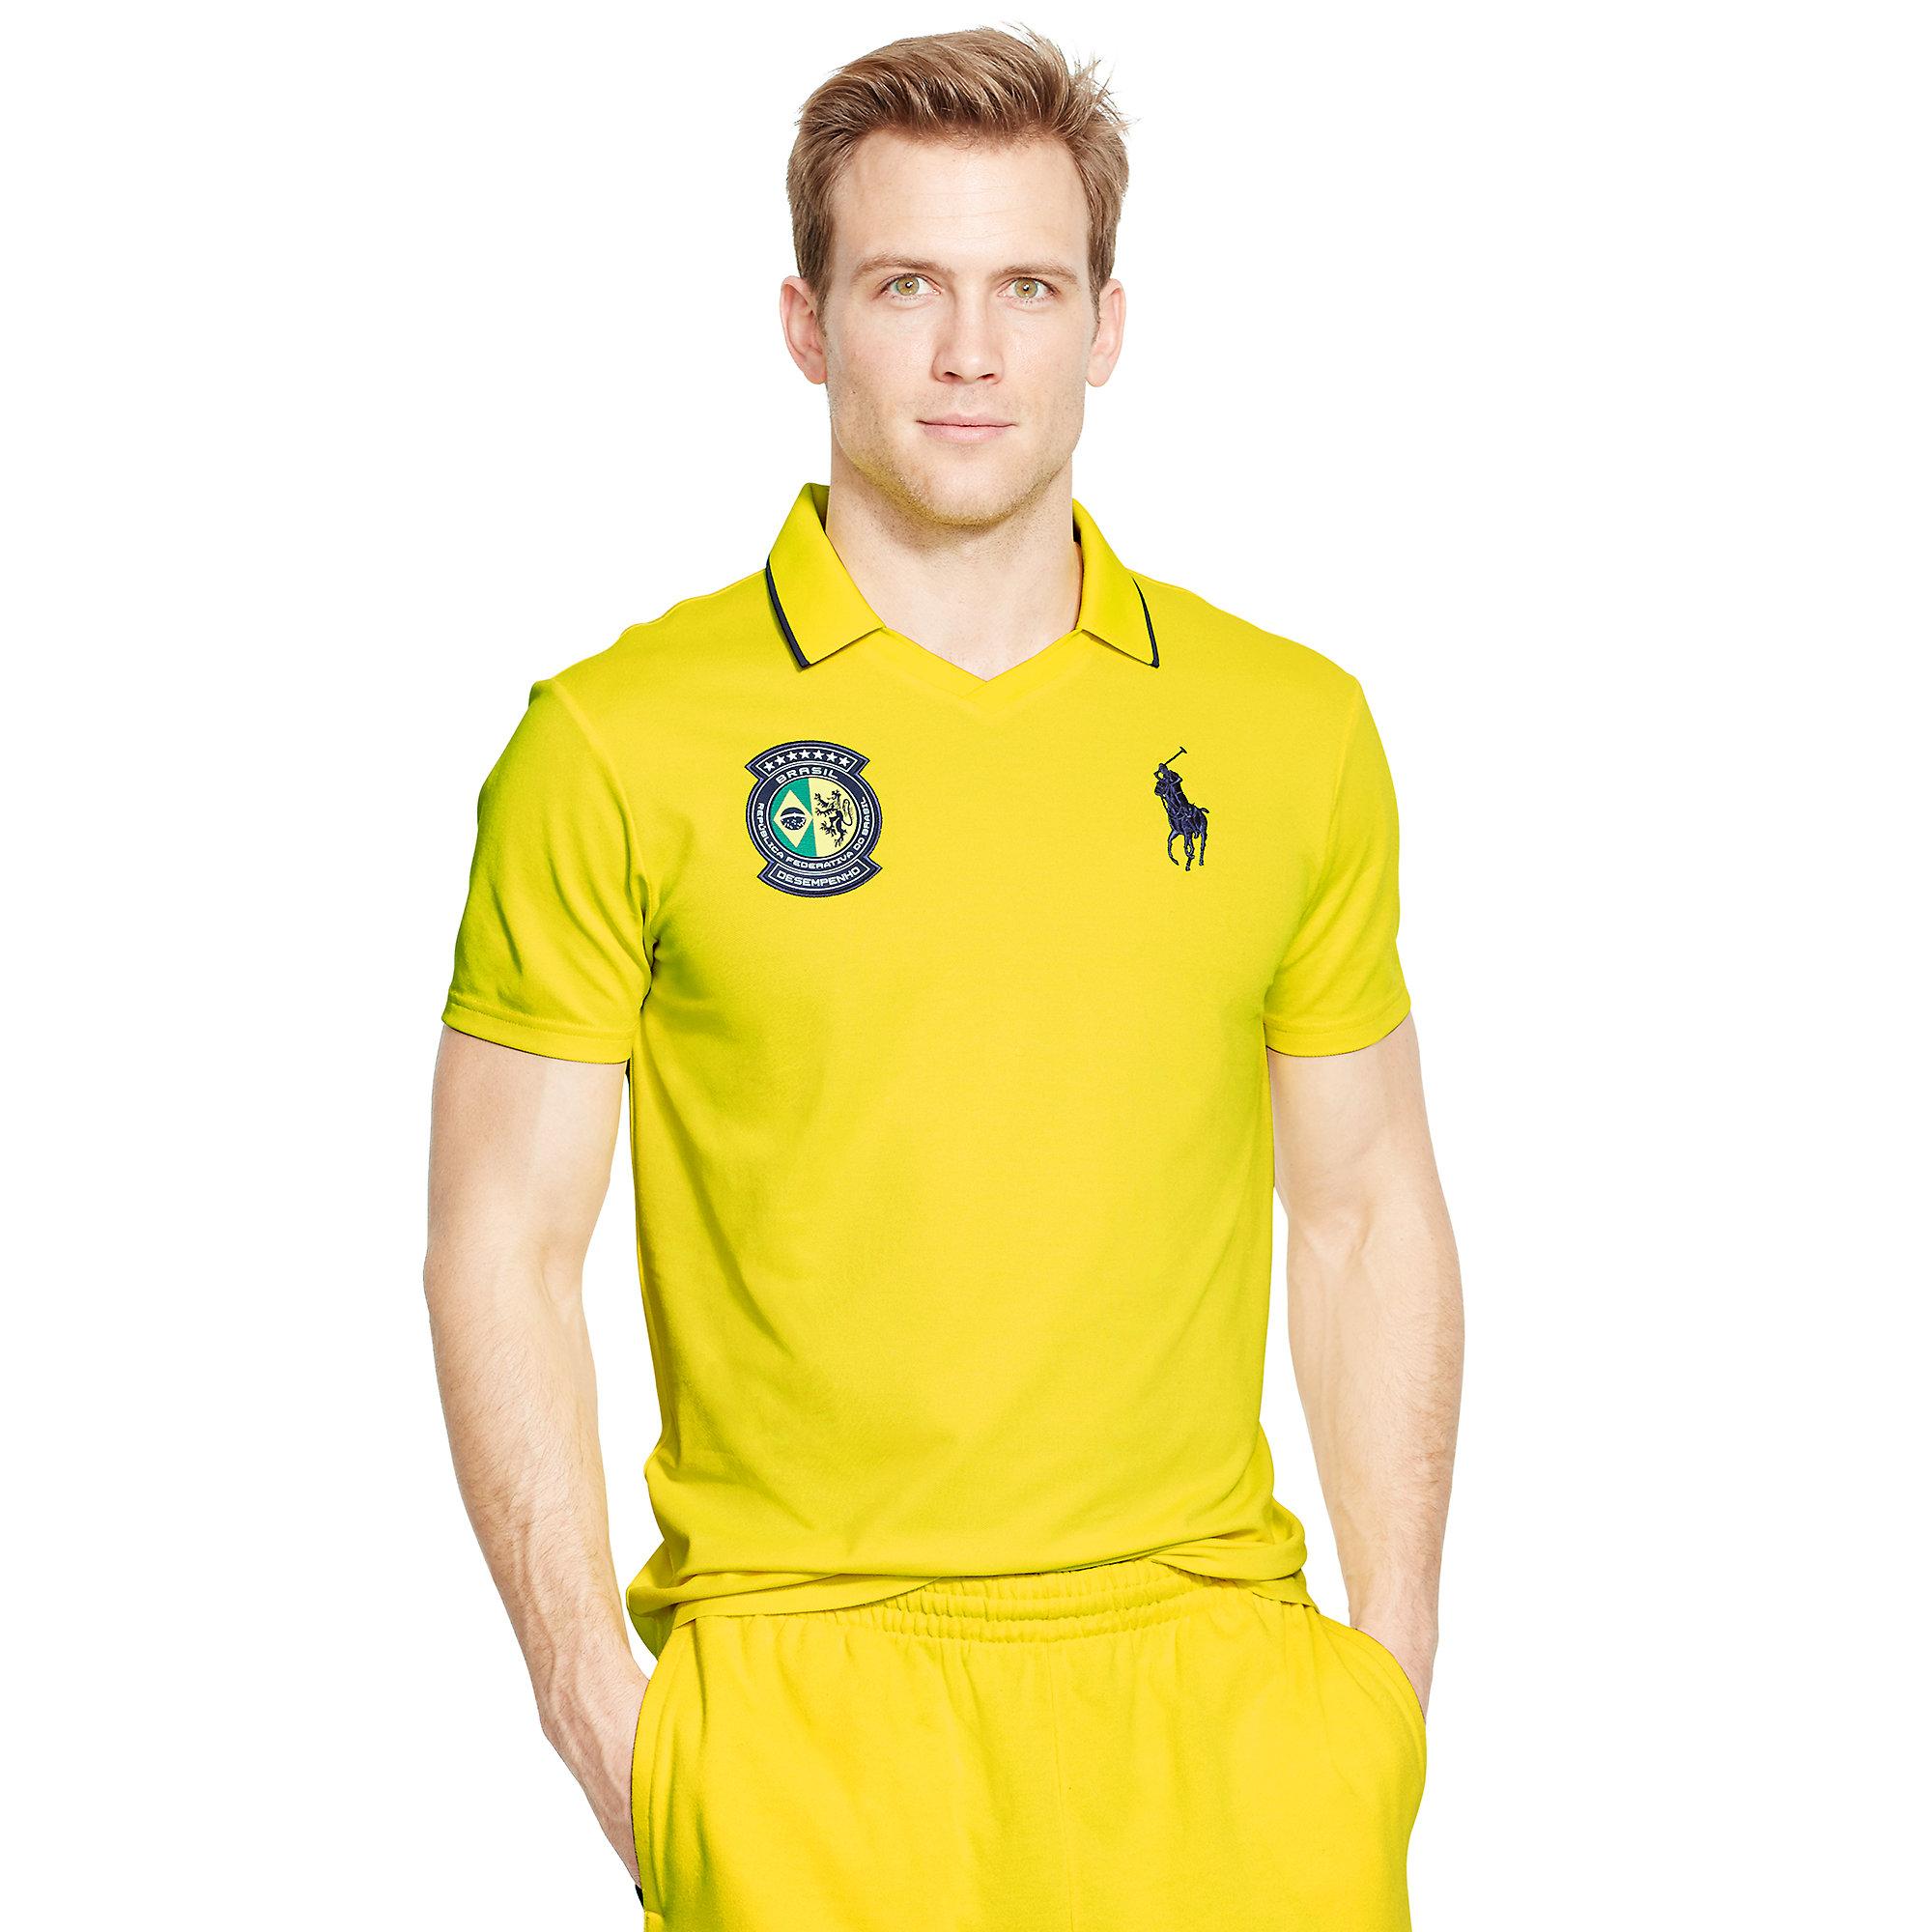 Men For Shirt Yellow Ralph Ewd9iyeh2 Polo Lauren Brazil RqS34Ajc5L